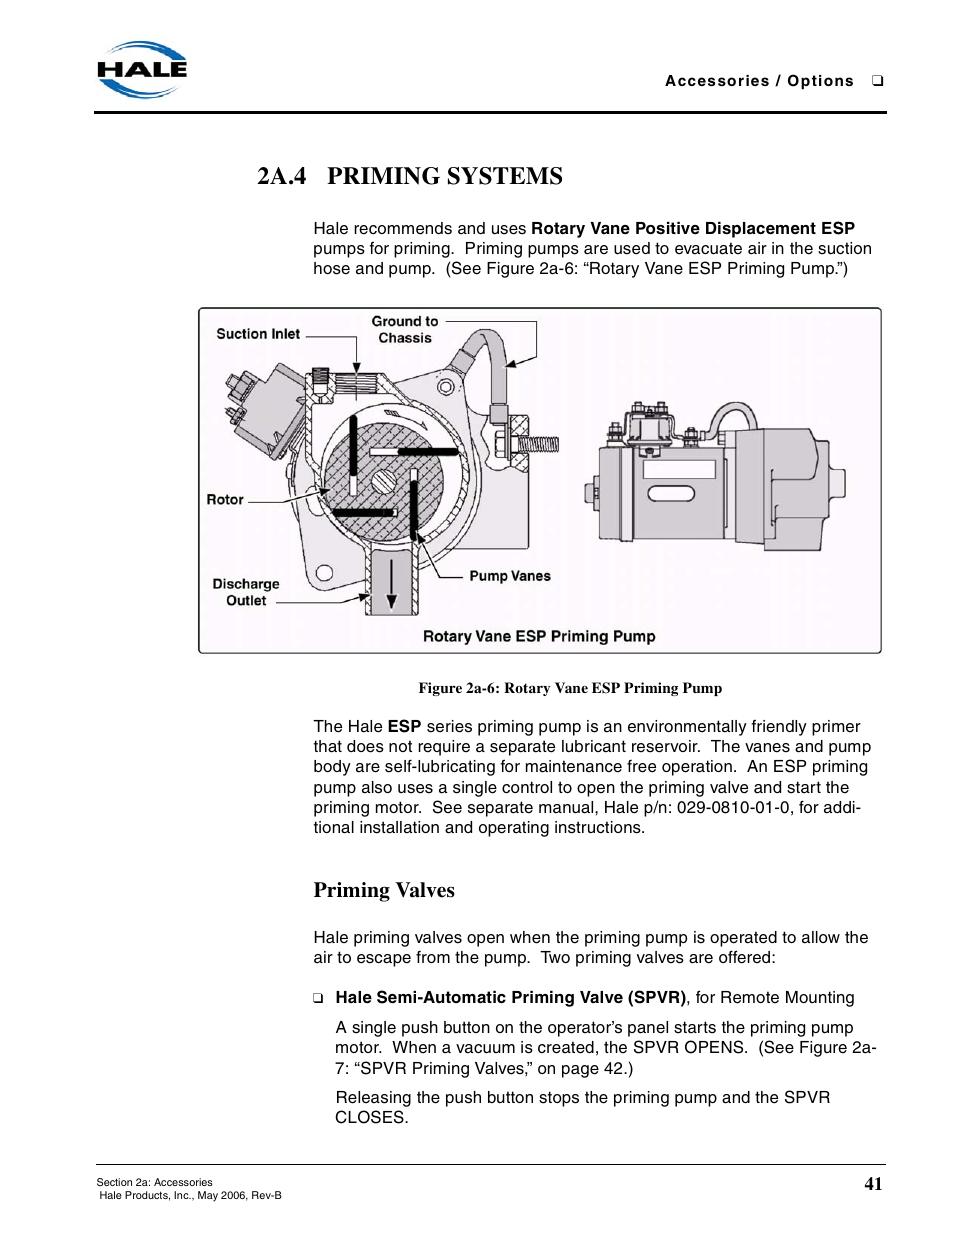 Hale Primer Pump Diagram Wiring Will Be A Thing Komatsu Fg Forklift 30011 2a 4 Priming Systems Figure 6 Rotary Vane Esp Rh Manualsdir Com Valve Fire